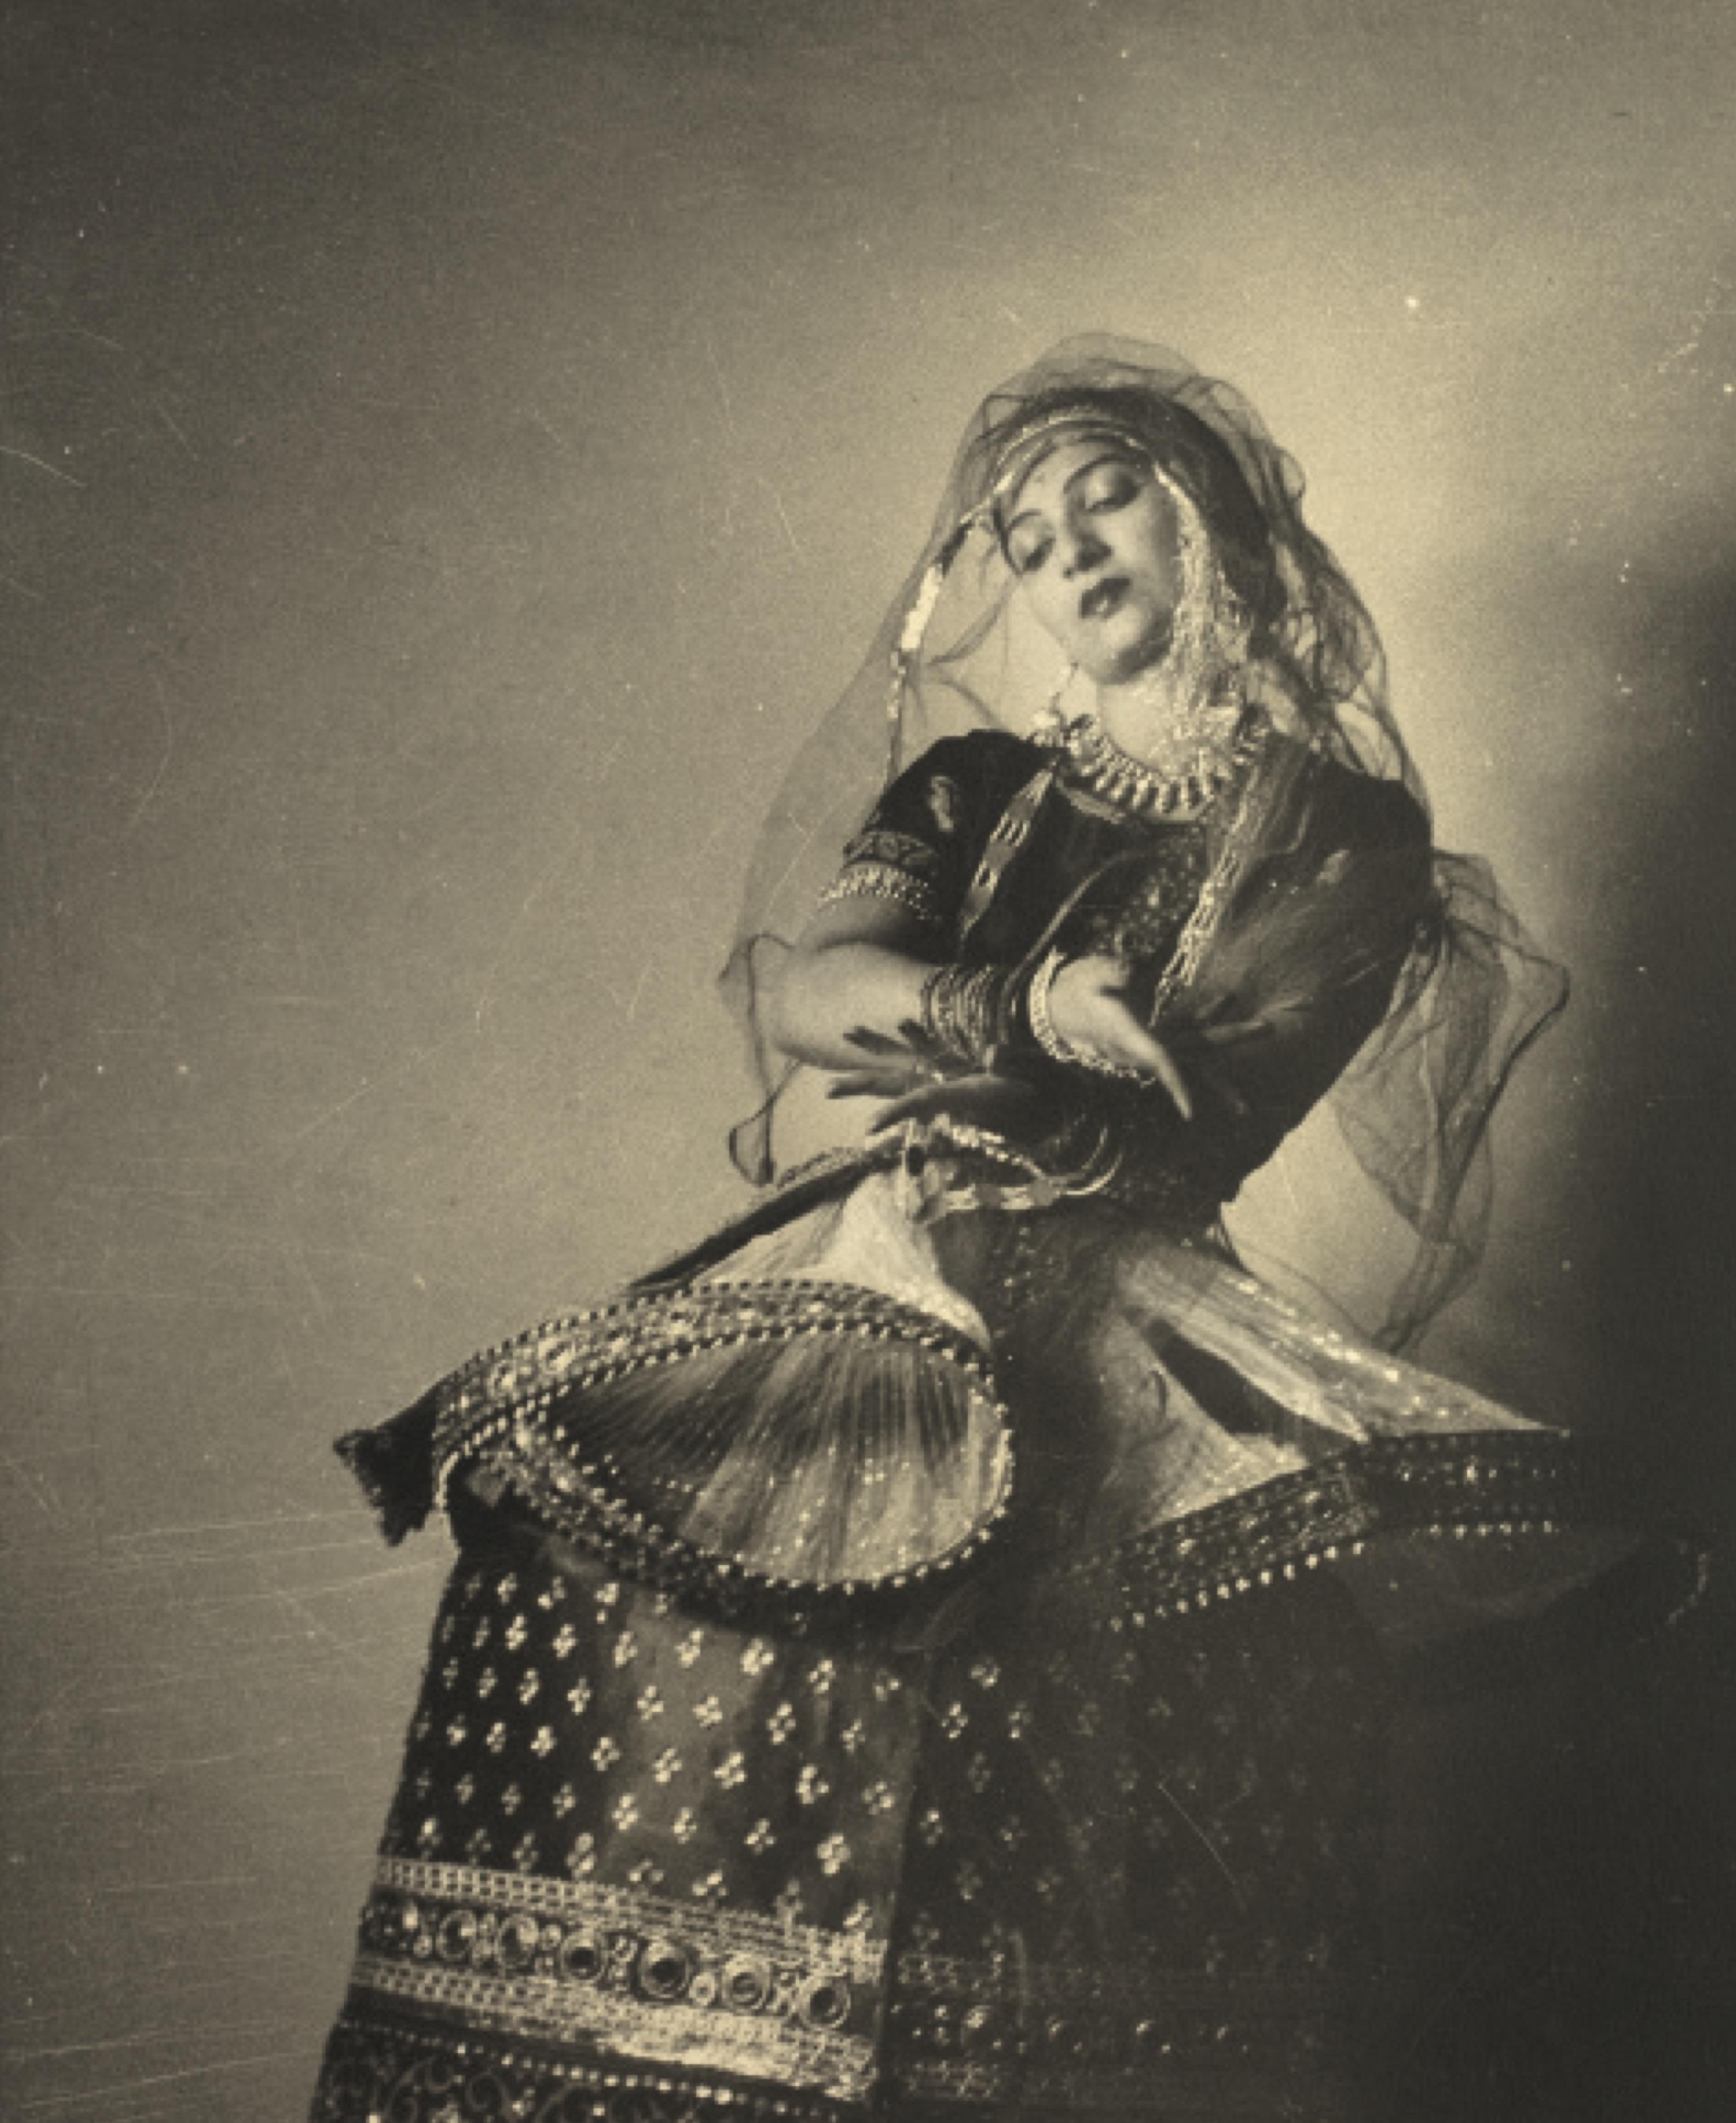 Ritha Devi, Manipuri dance. Credit: Sunil Janah. From the Swaraj Art Archive